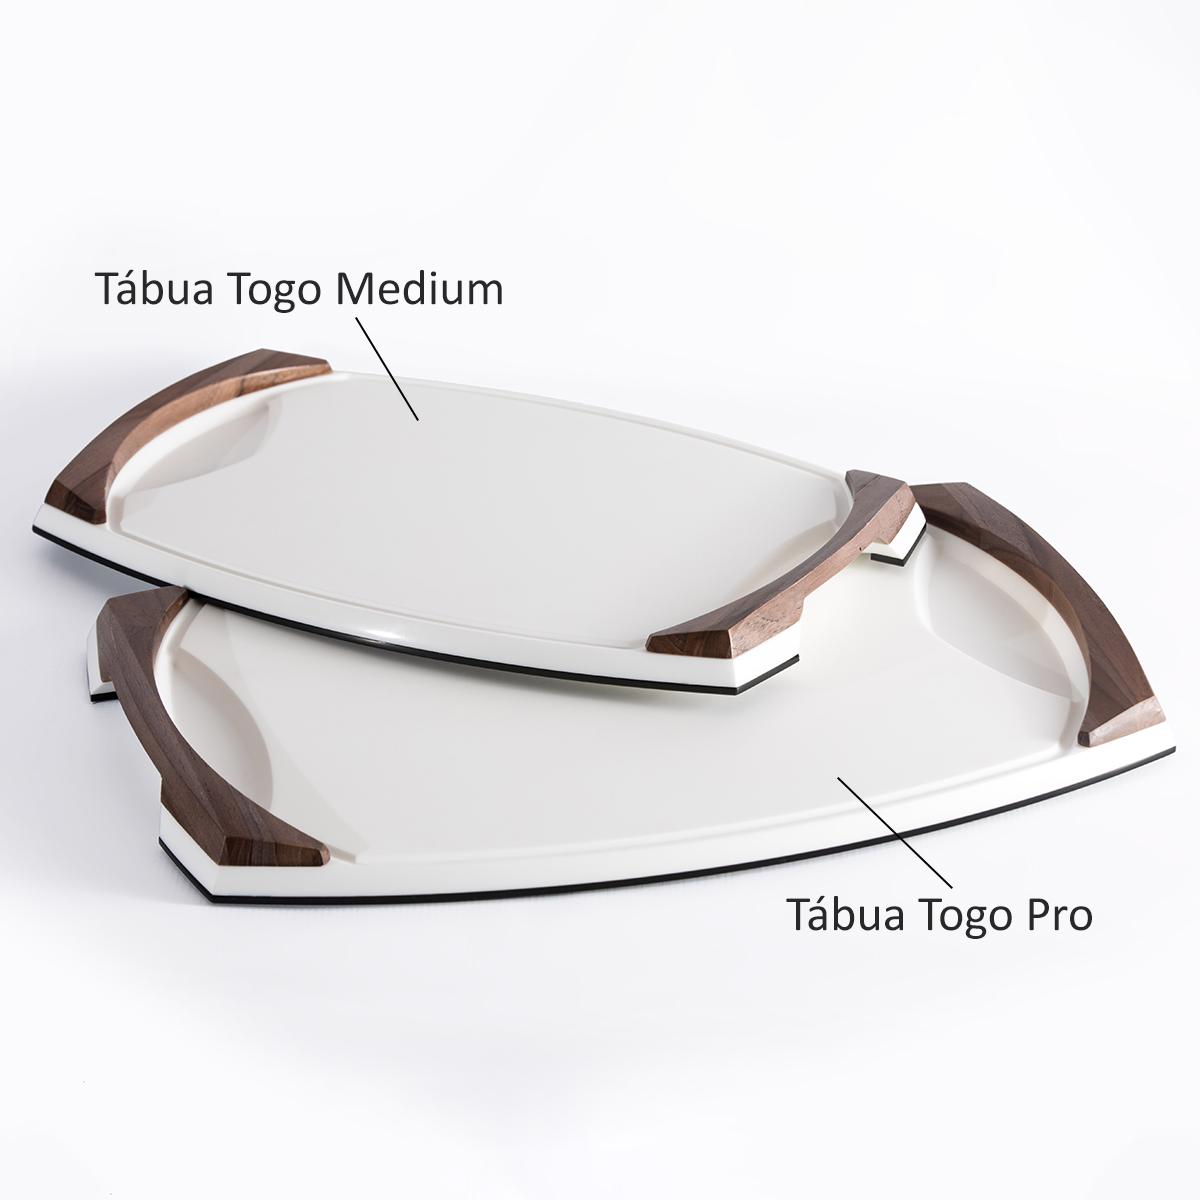 Tábua de Churrasco Togo White Medium